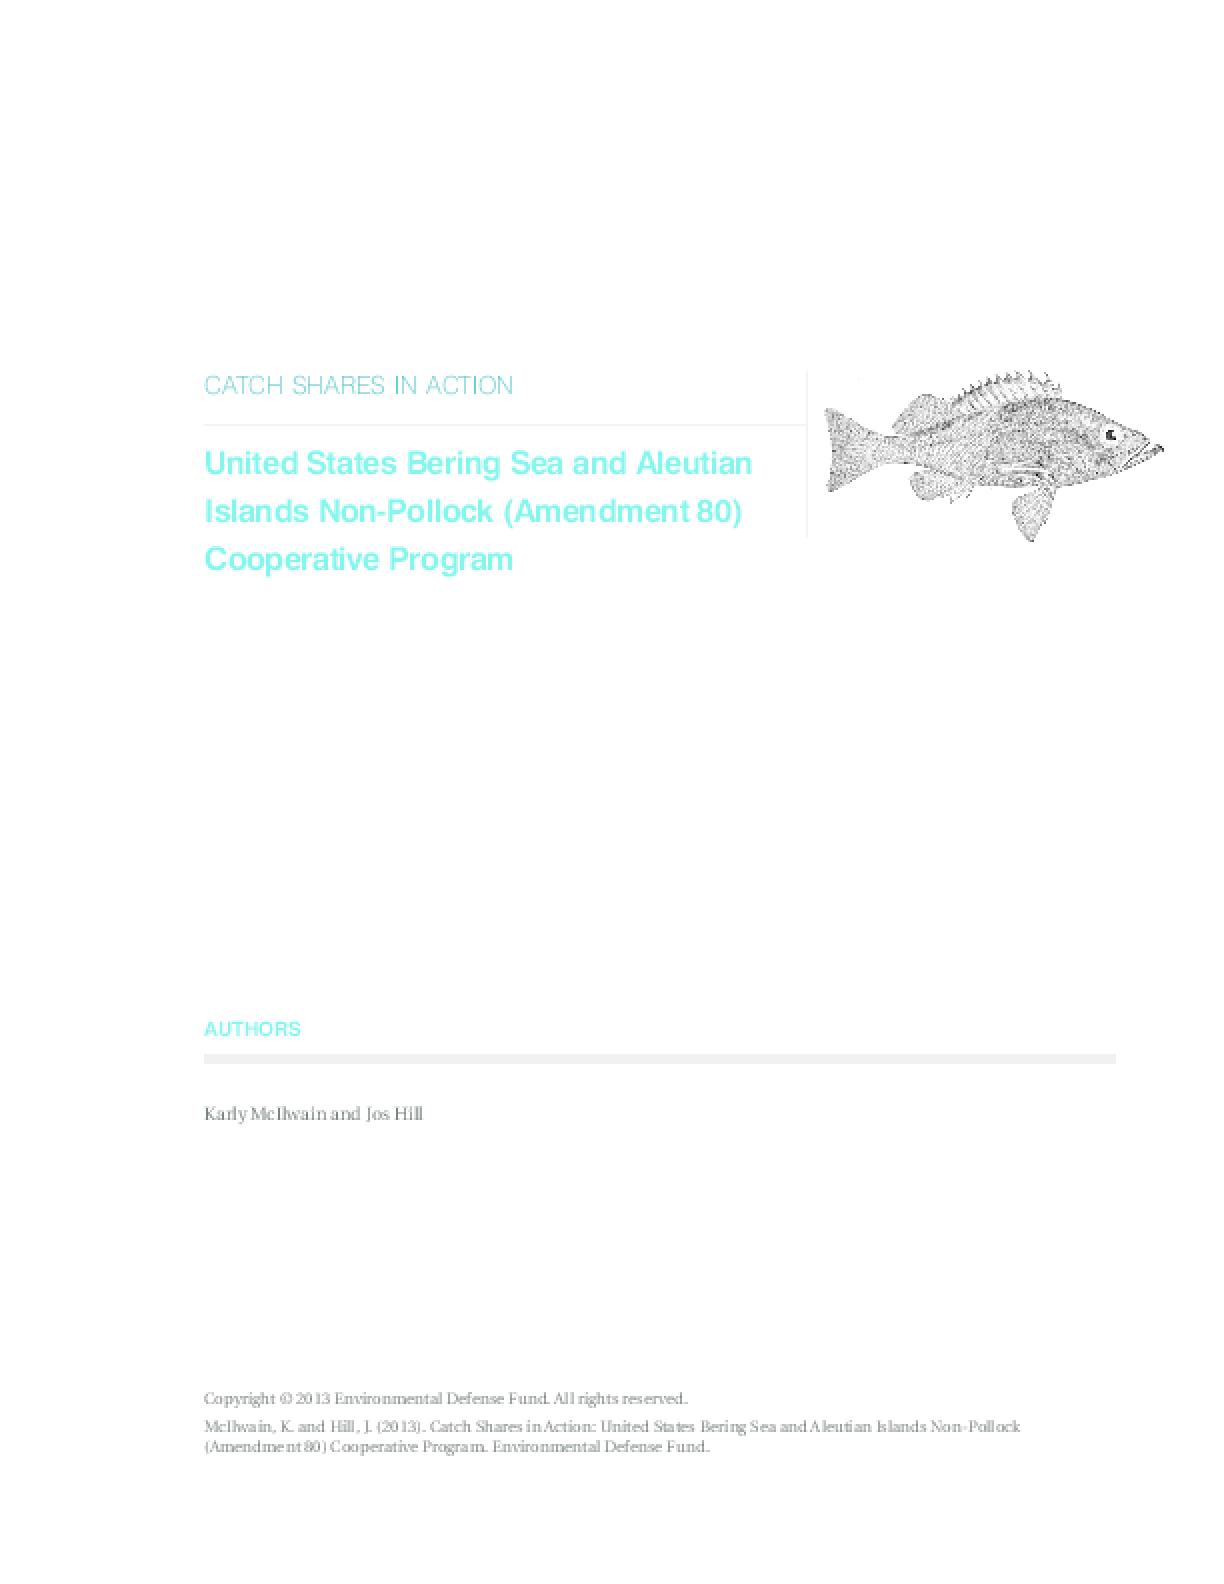 Catch Shares in Action: United States Bering Sea and Aleutian Islands Non-Pollock (Amendment 80) Cooperative Program